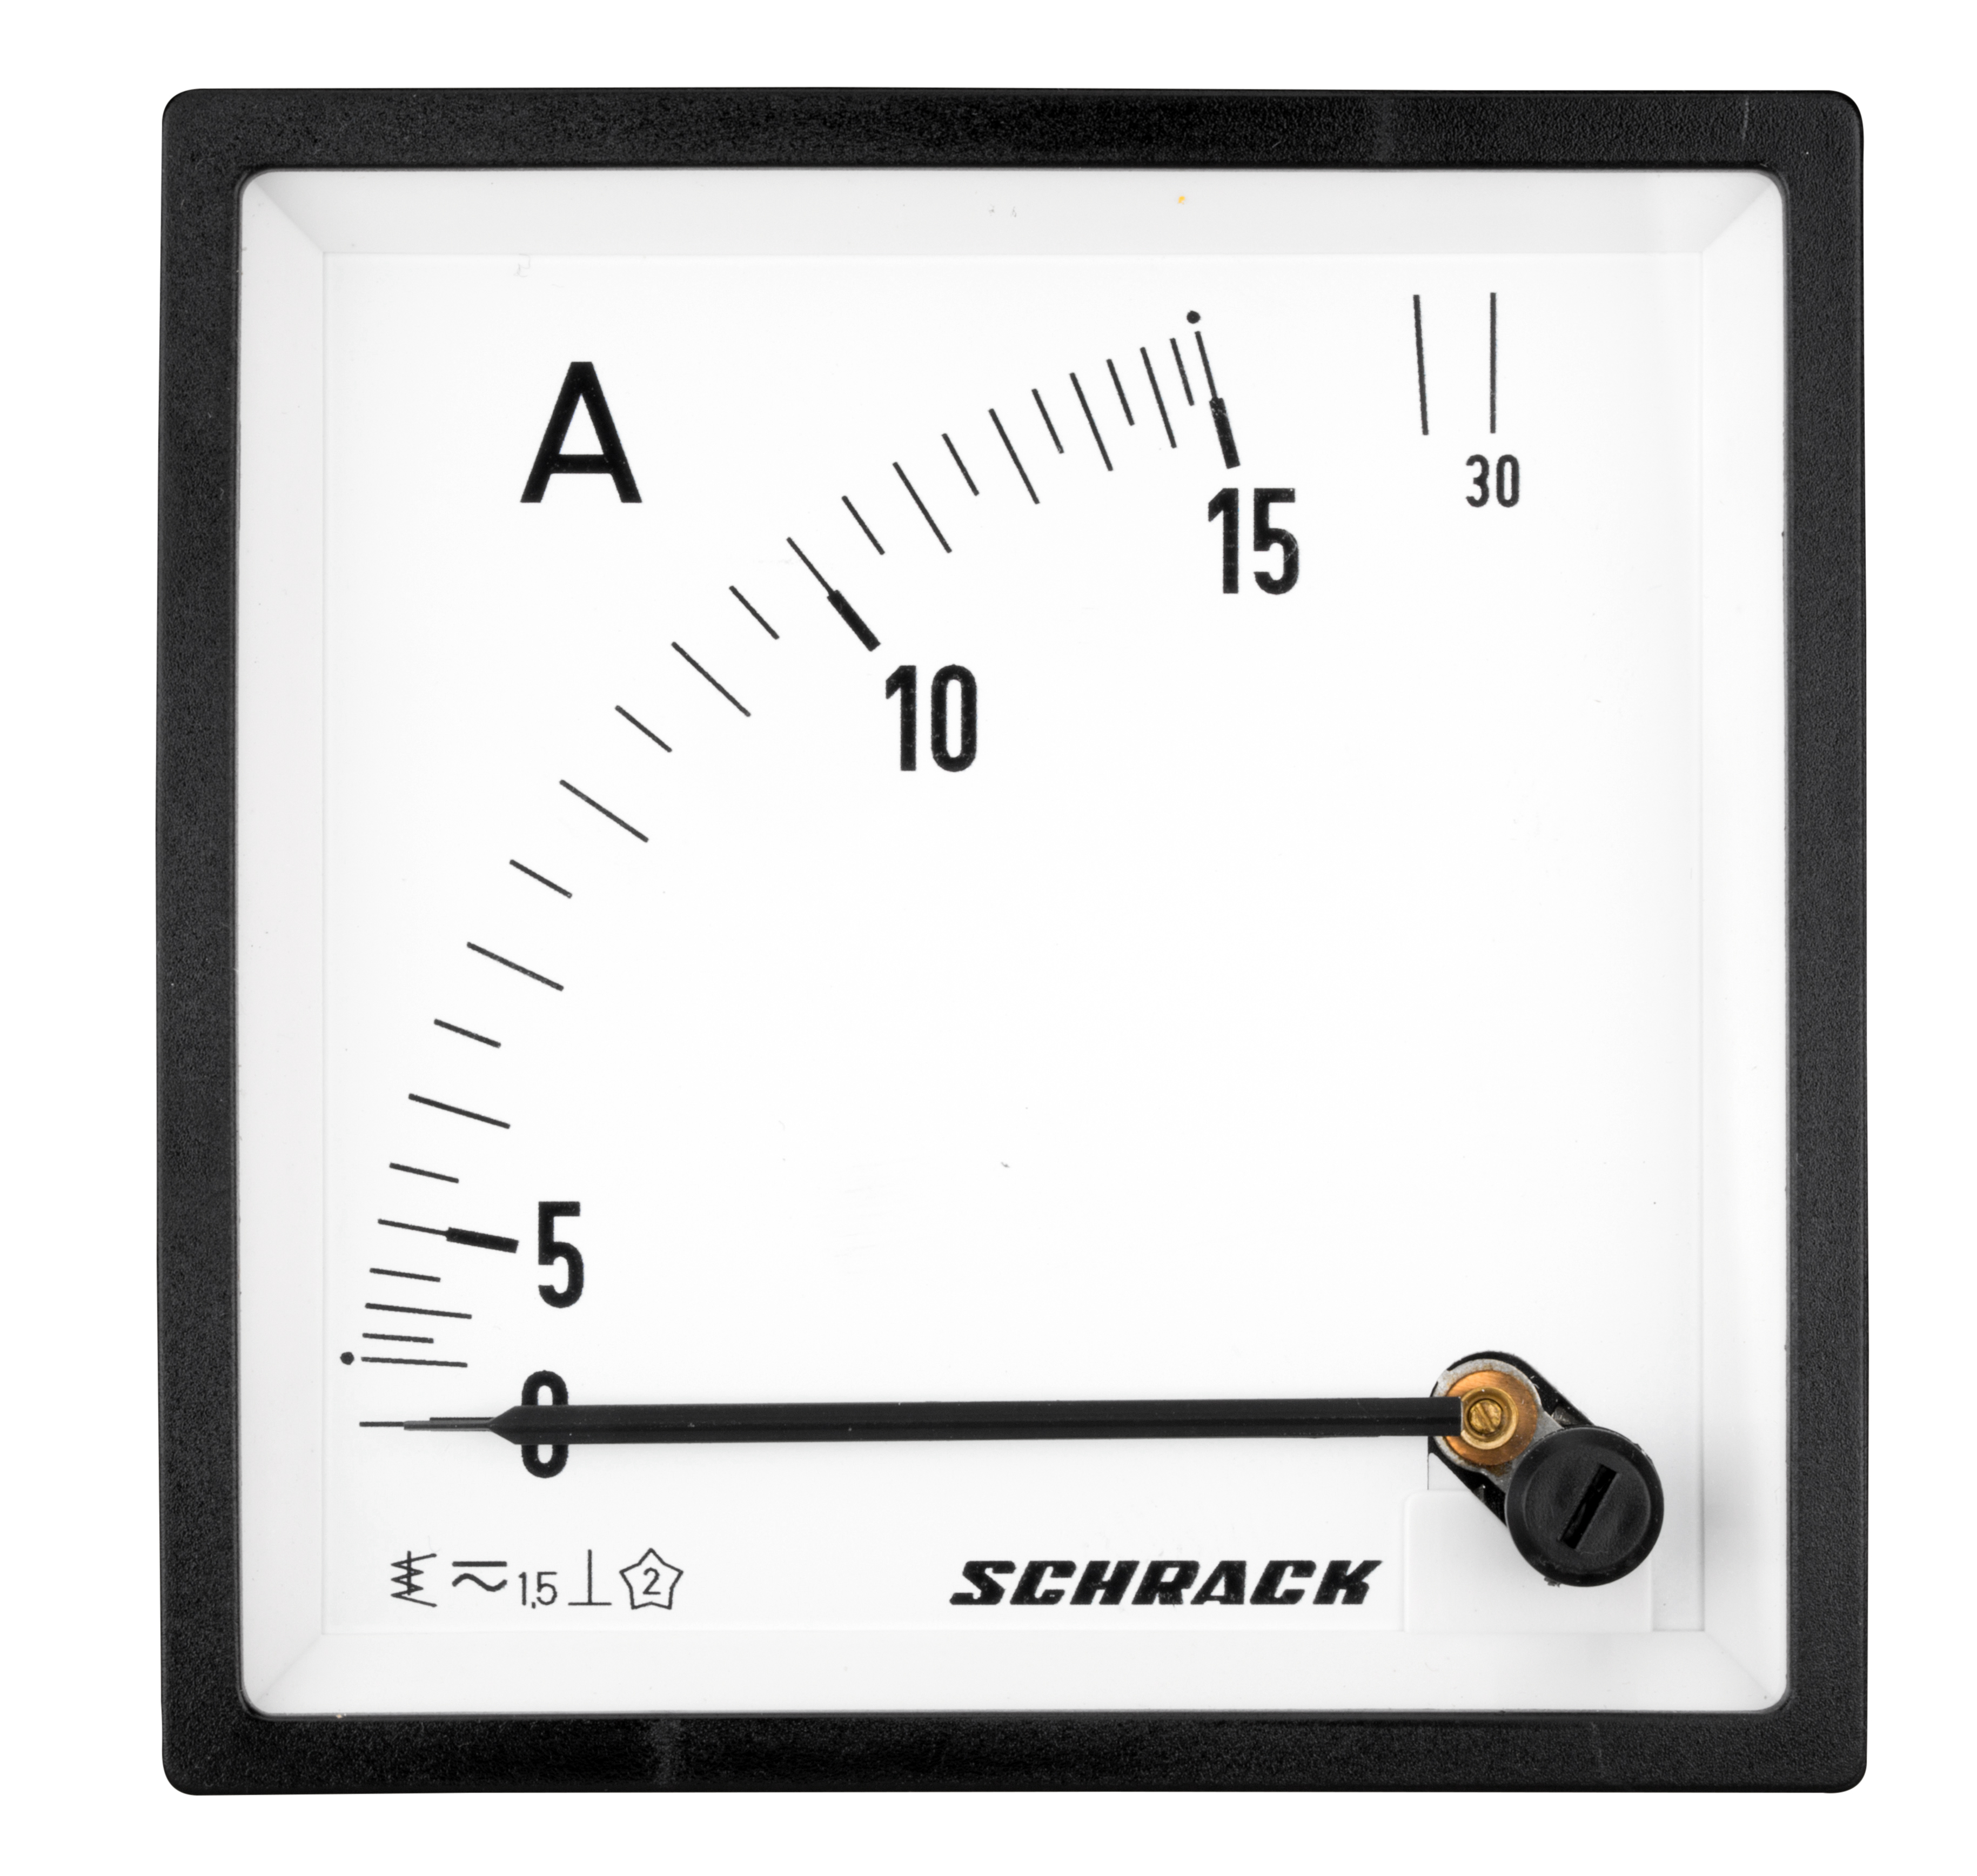 1 Stk Amperemeter, 96x96mm, 15A AC Direktmessung MGF59015-A